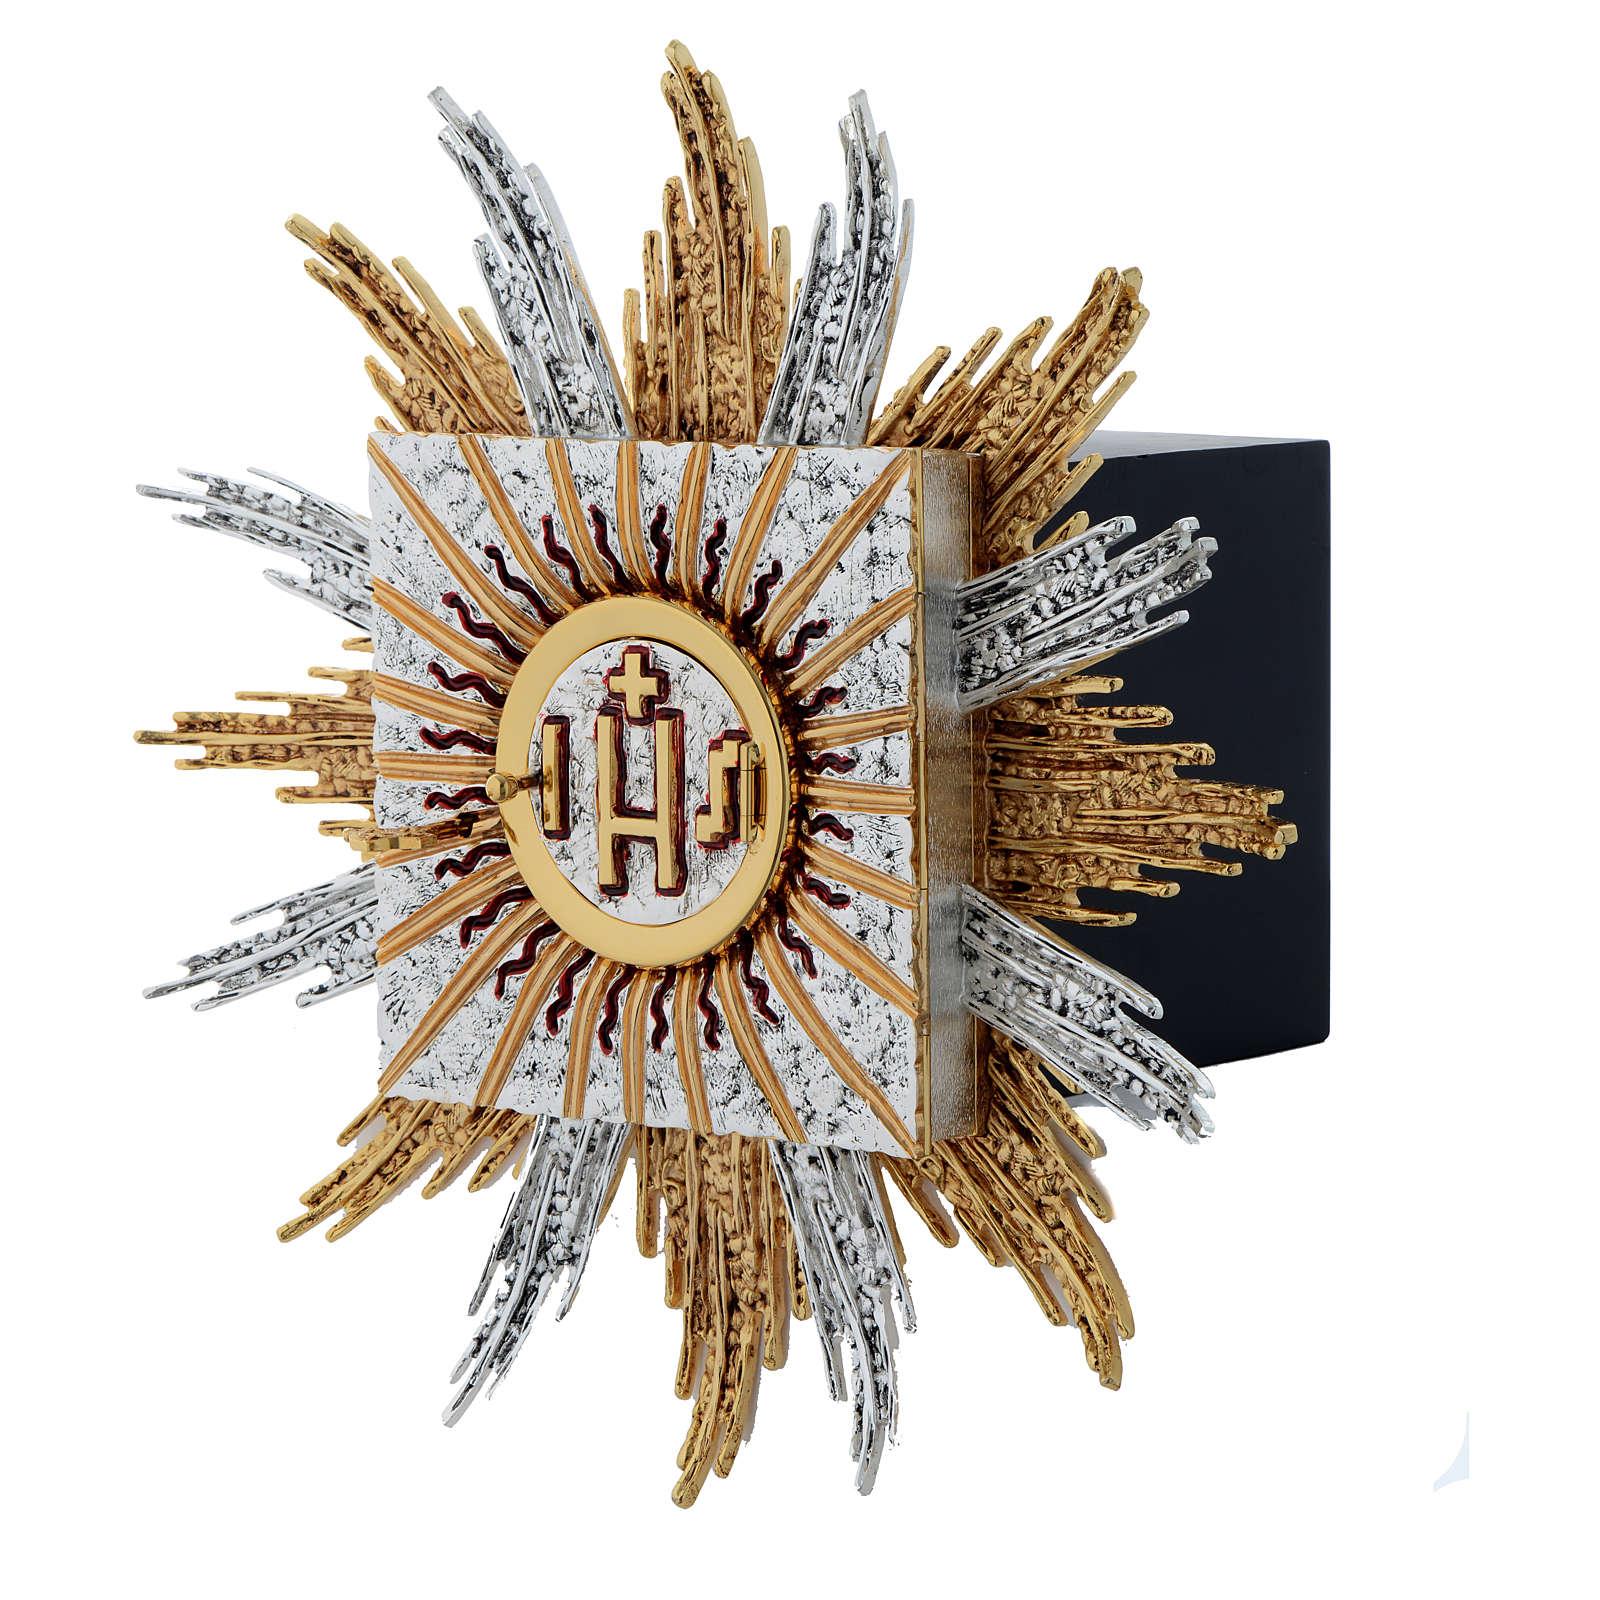 tabernacle à accrocher laiton or argent ihs rayons   vente en ligne